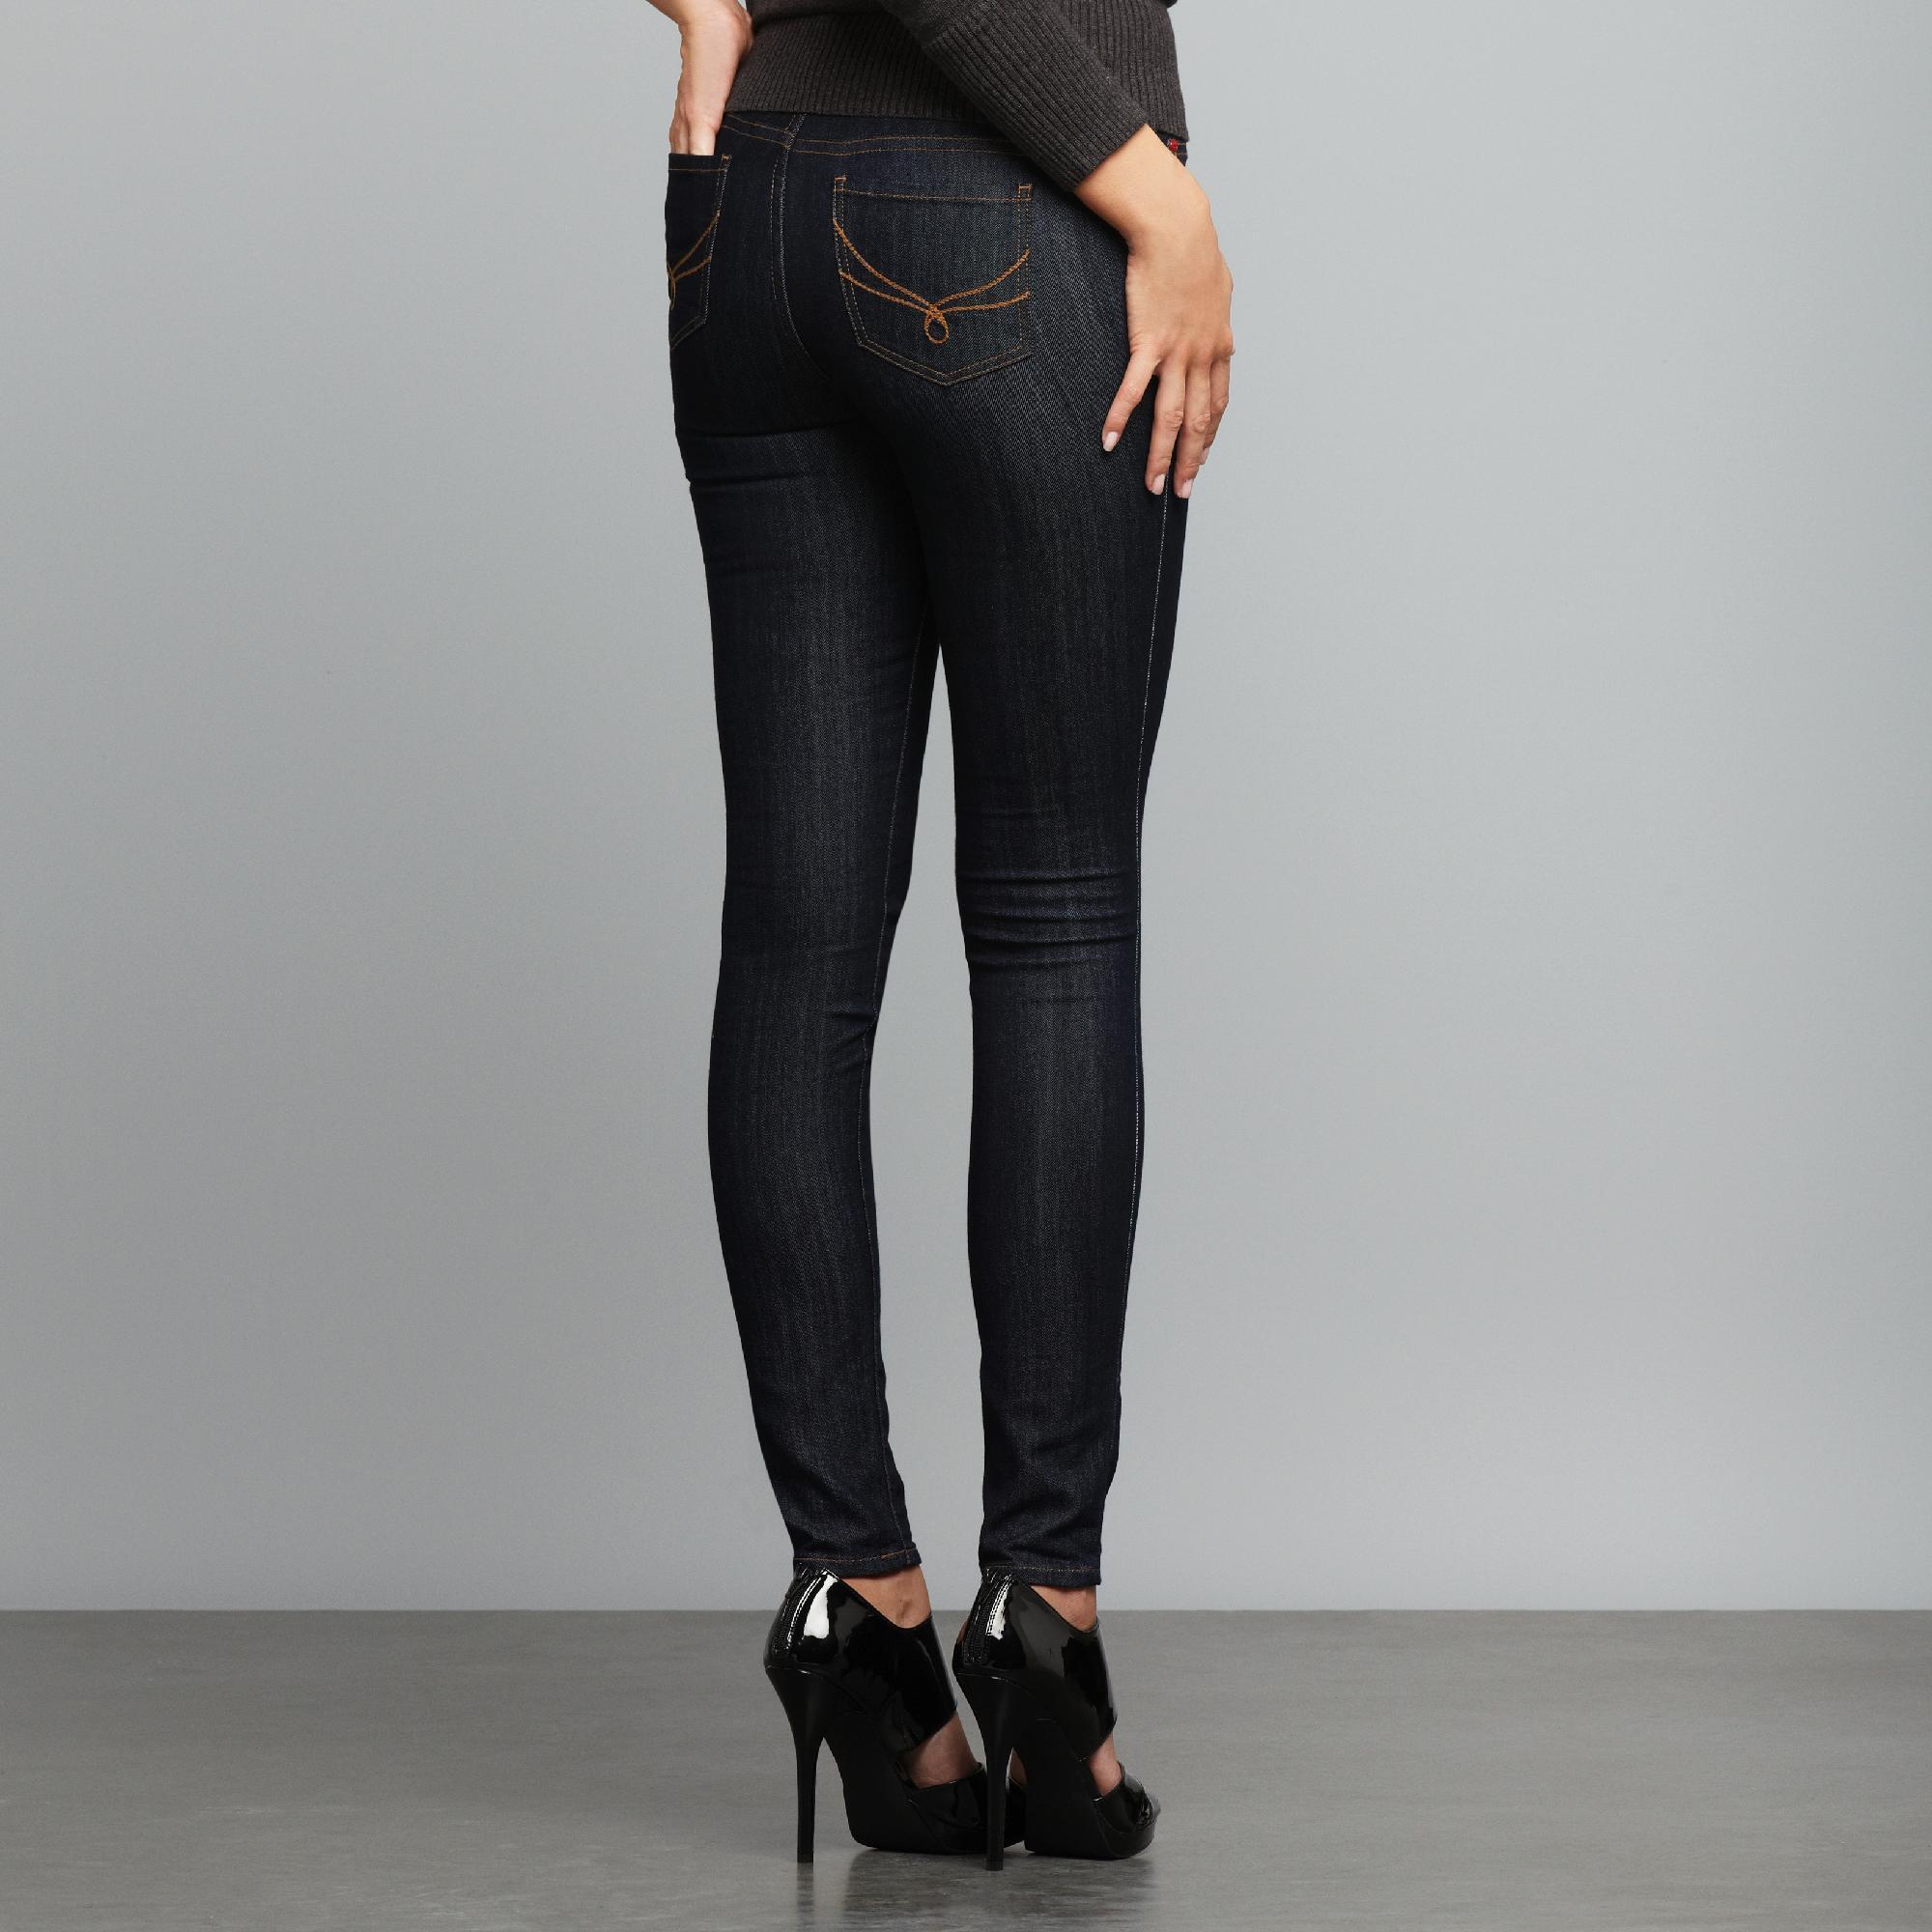 Sofia by Sofia Vergara Women's Jegging Jeans